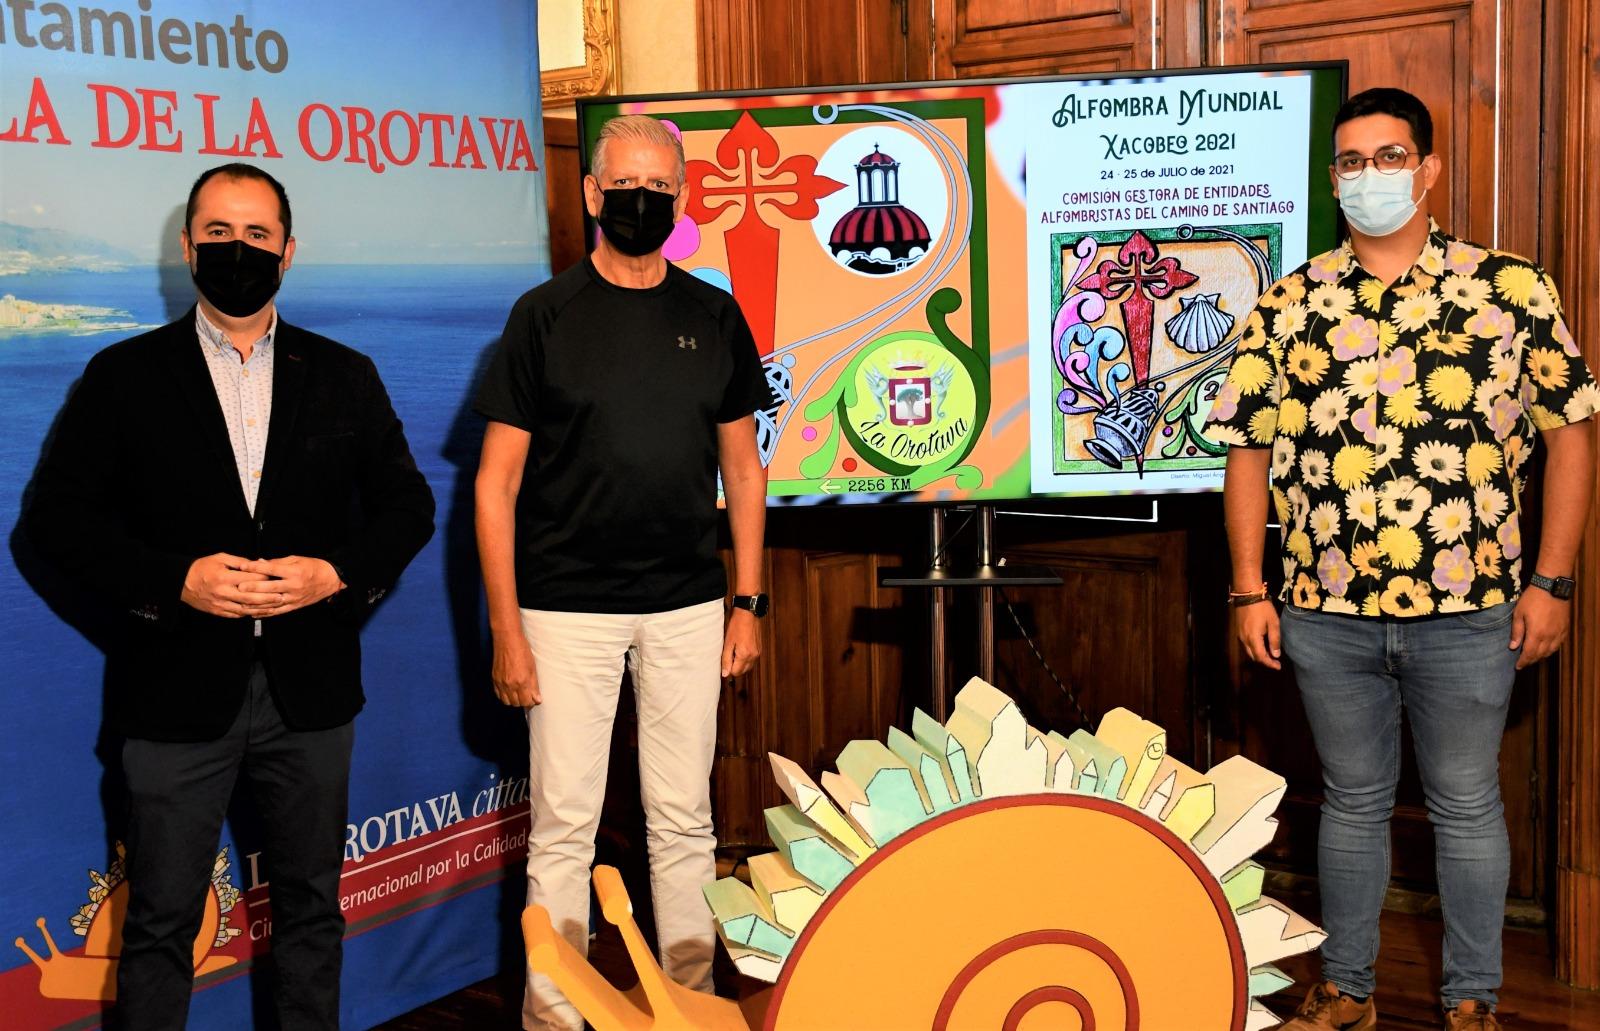 La Orotava se suma a la iniciativa 'Alfombra Mundial' del Año Xacobeo 2021